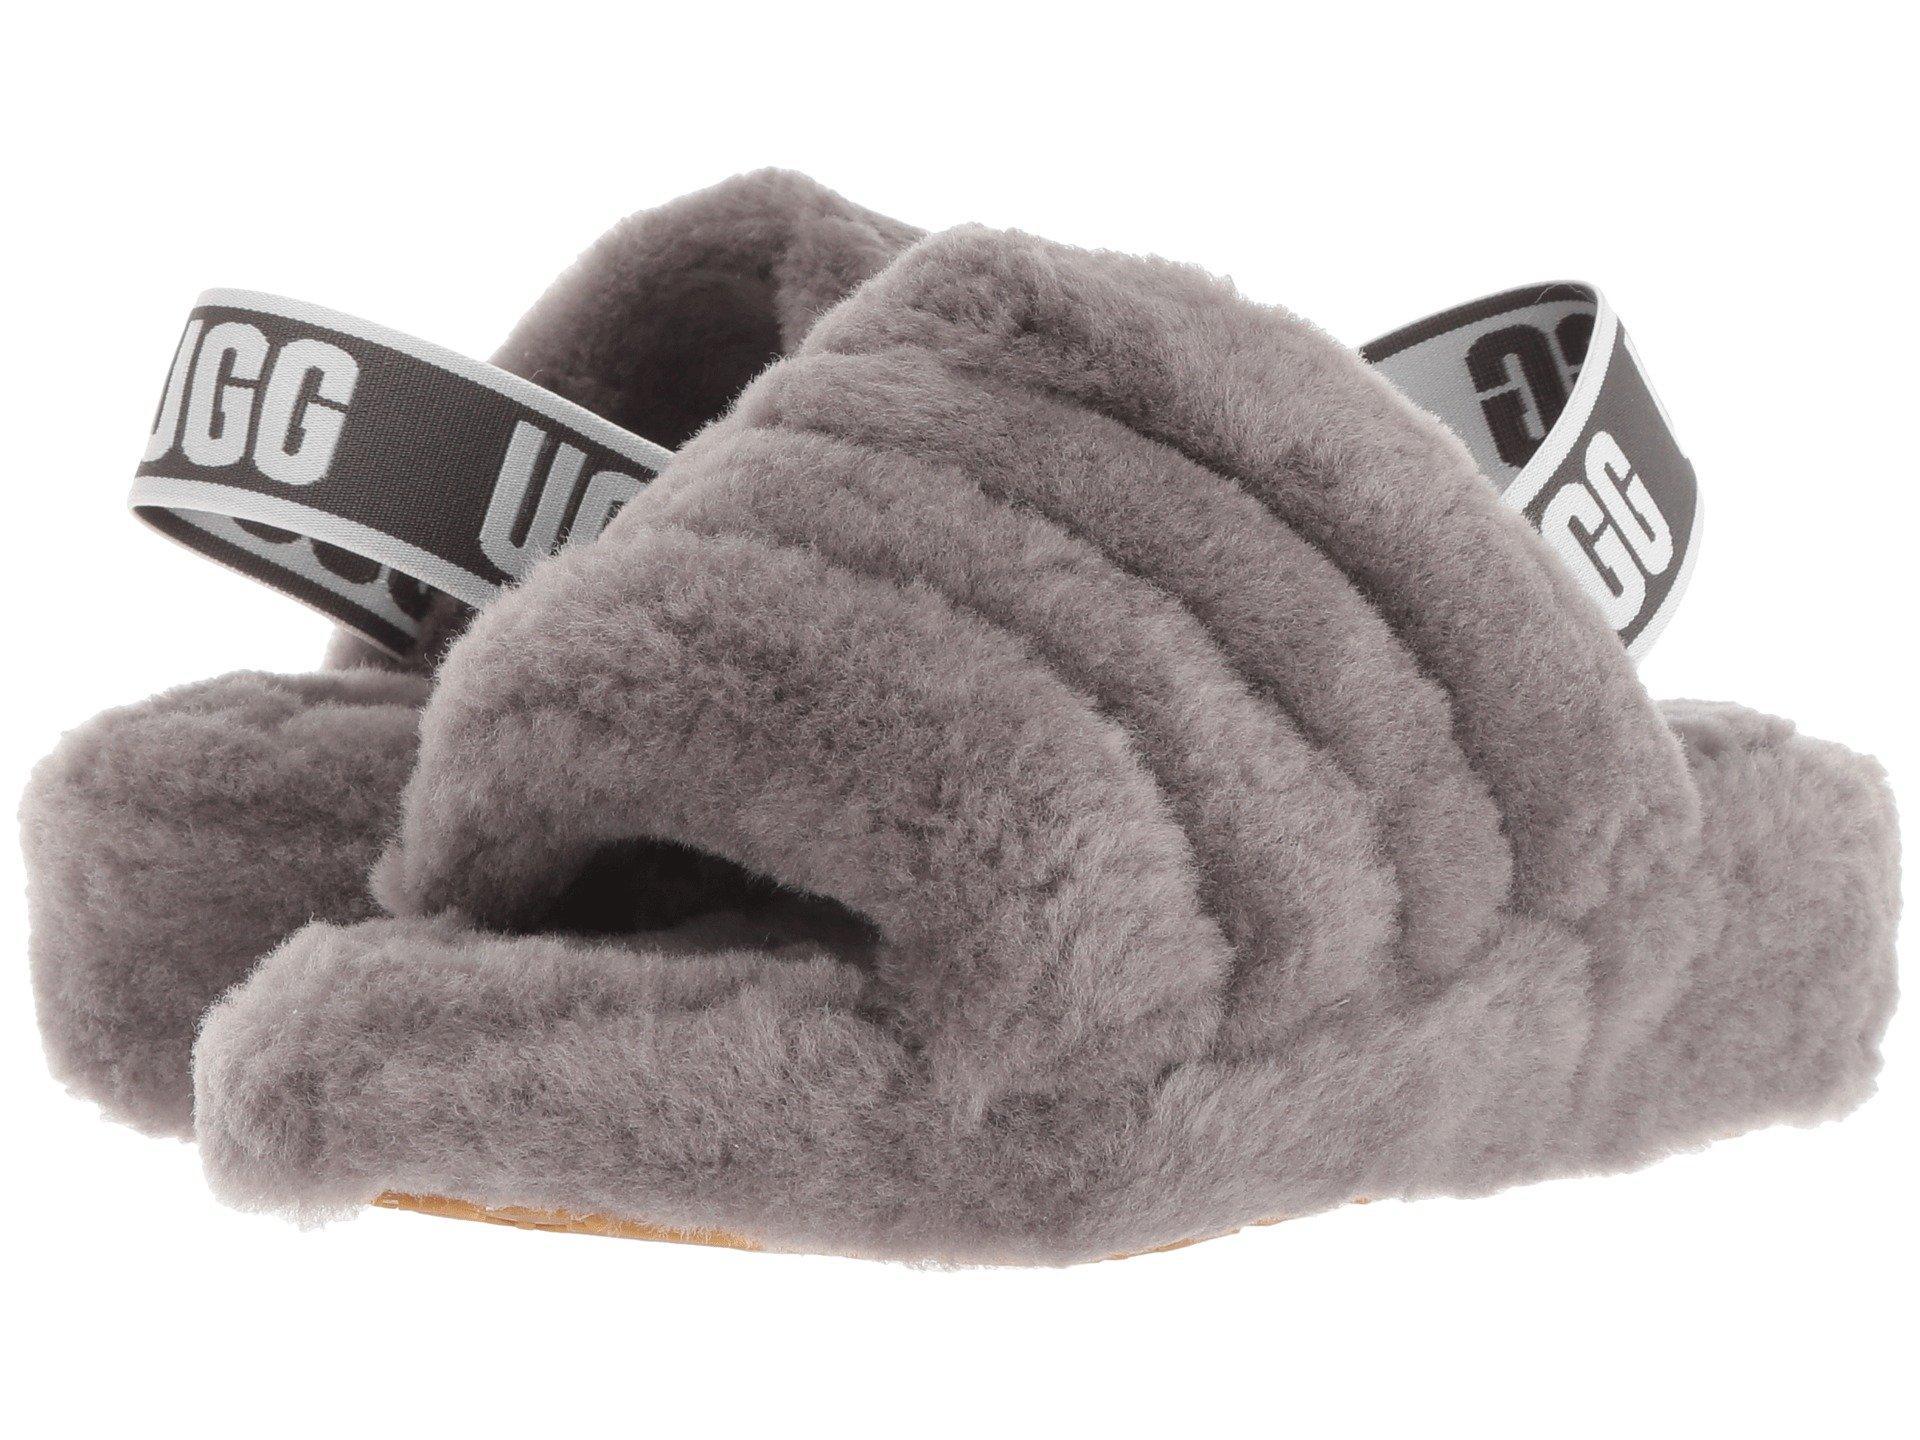 7bdac7dc16bc0 Lyst - UGG Fluff Yeah Fur Slides in Gray - Save 37%